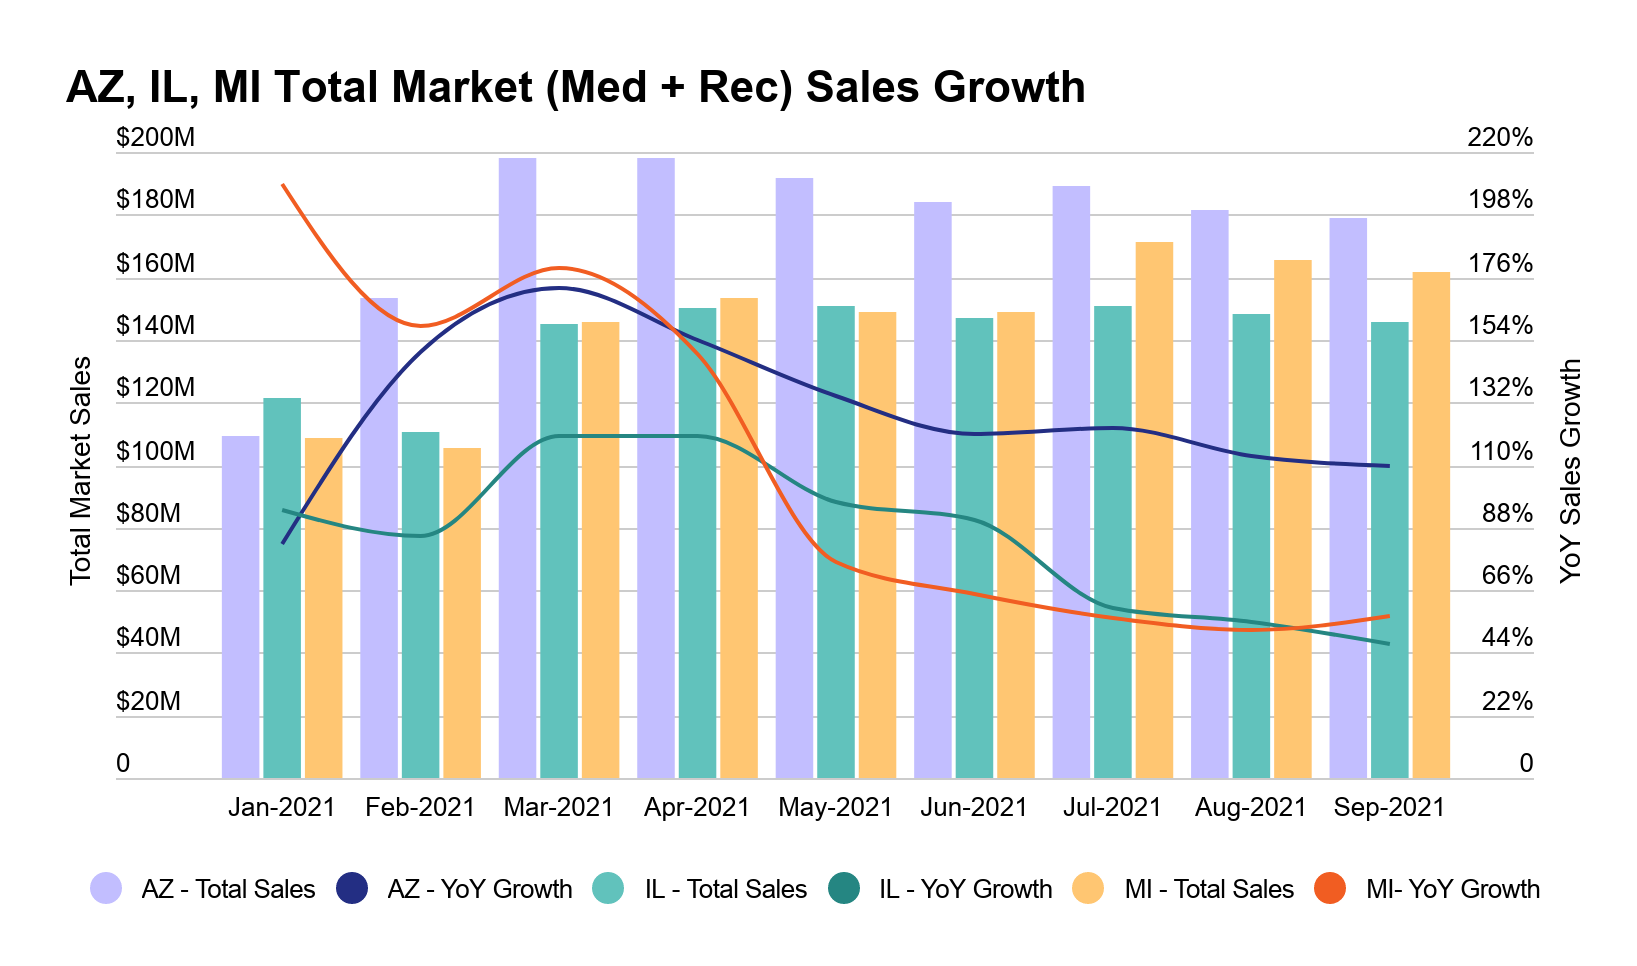 Arizona cannabis market report image 2: Medical and recreational cannabis sales growth in Arizona, Illinois and Michigan